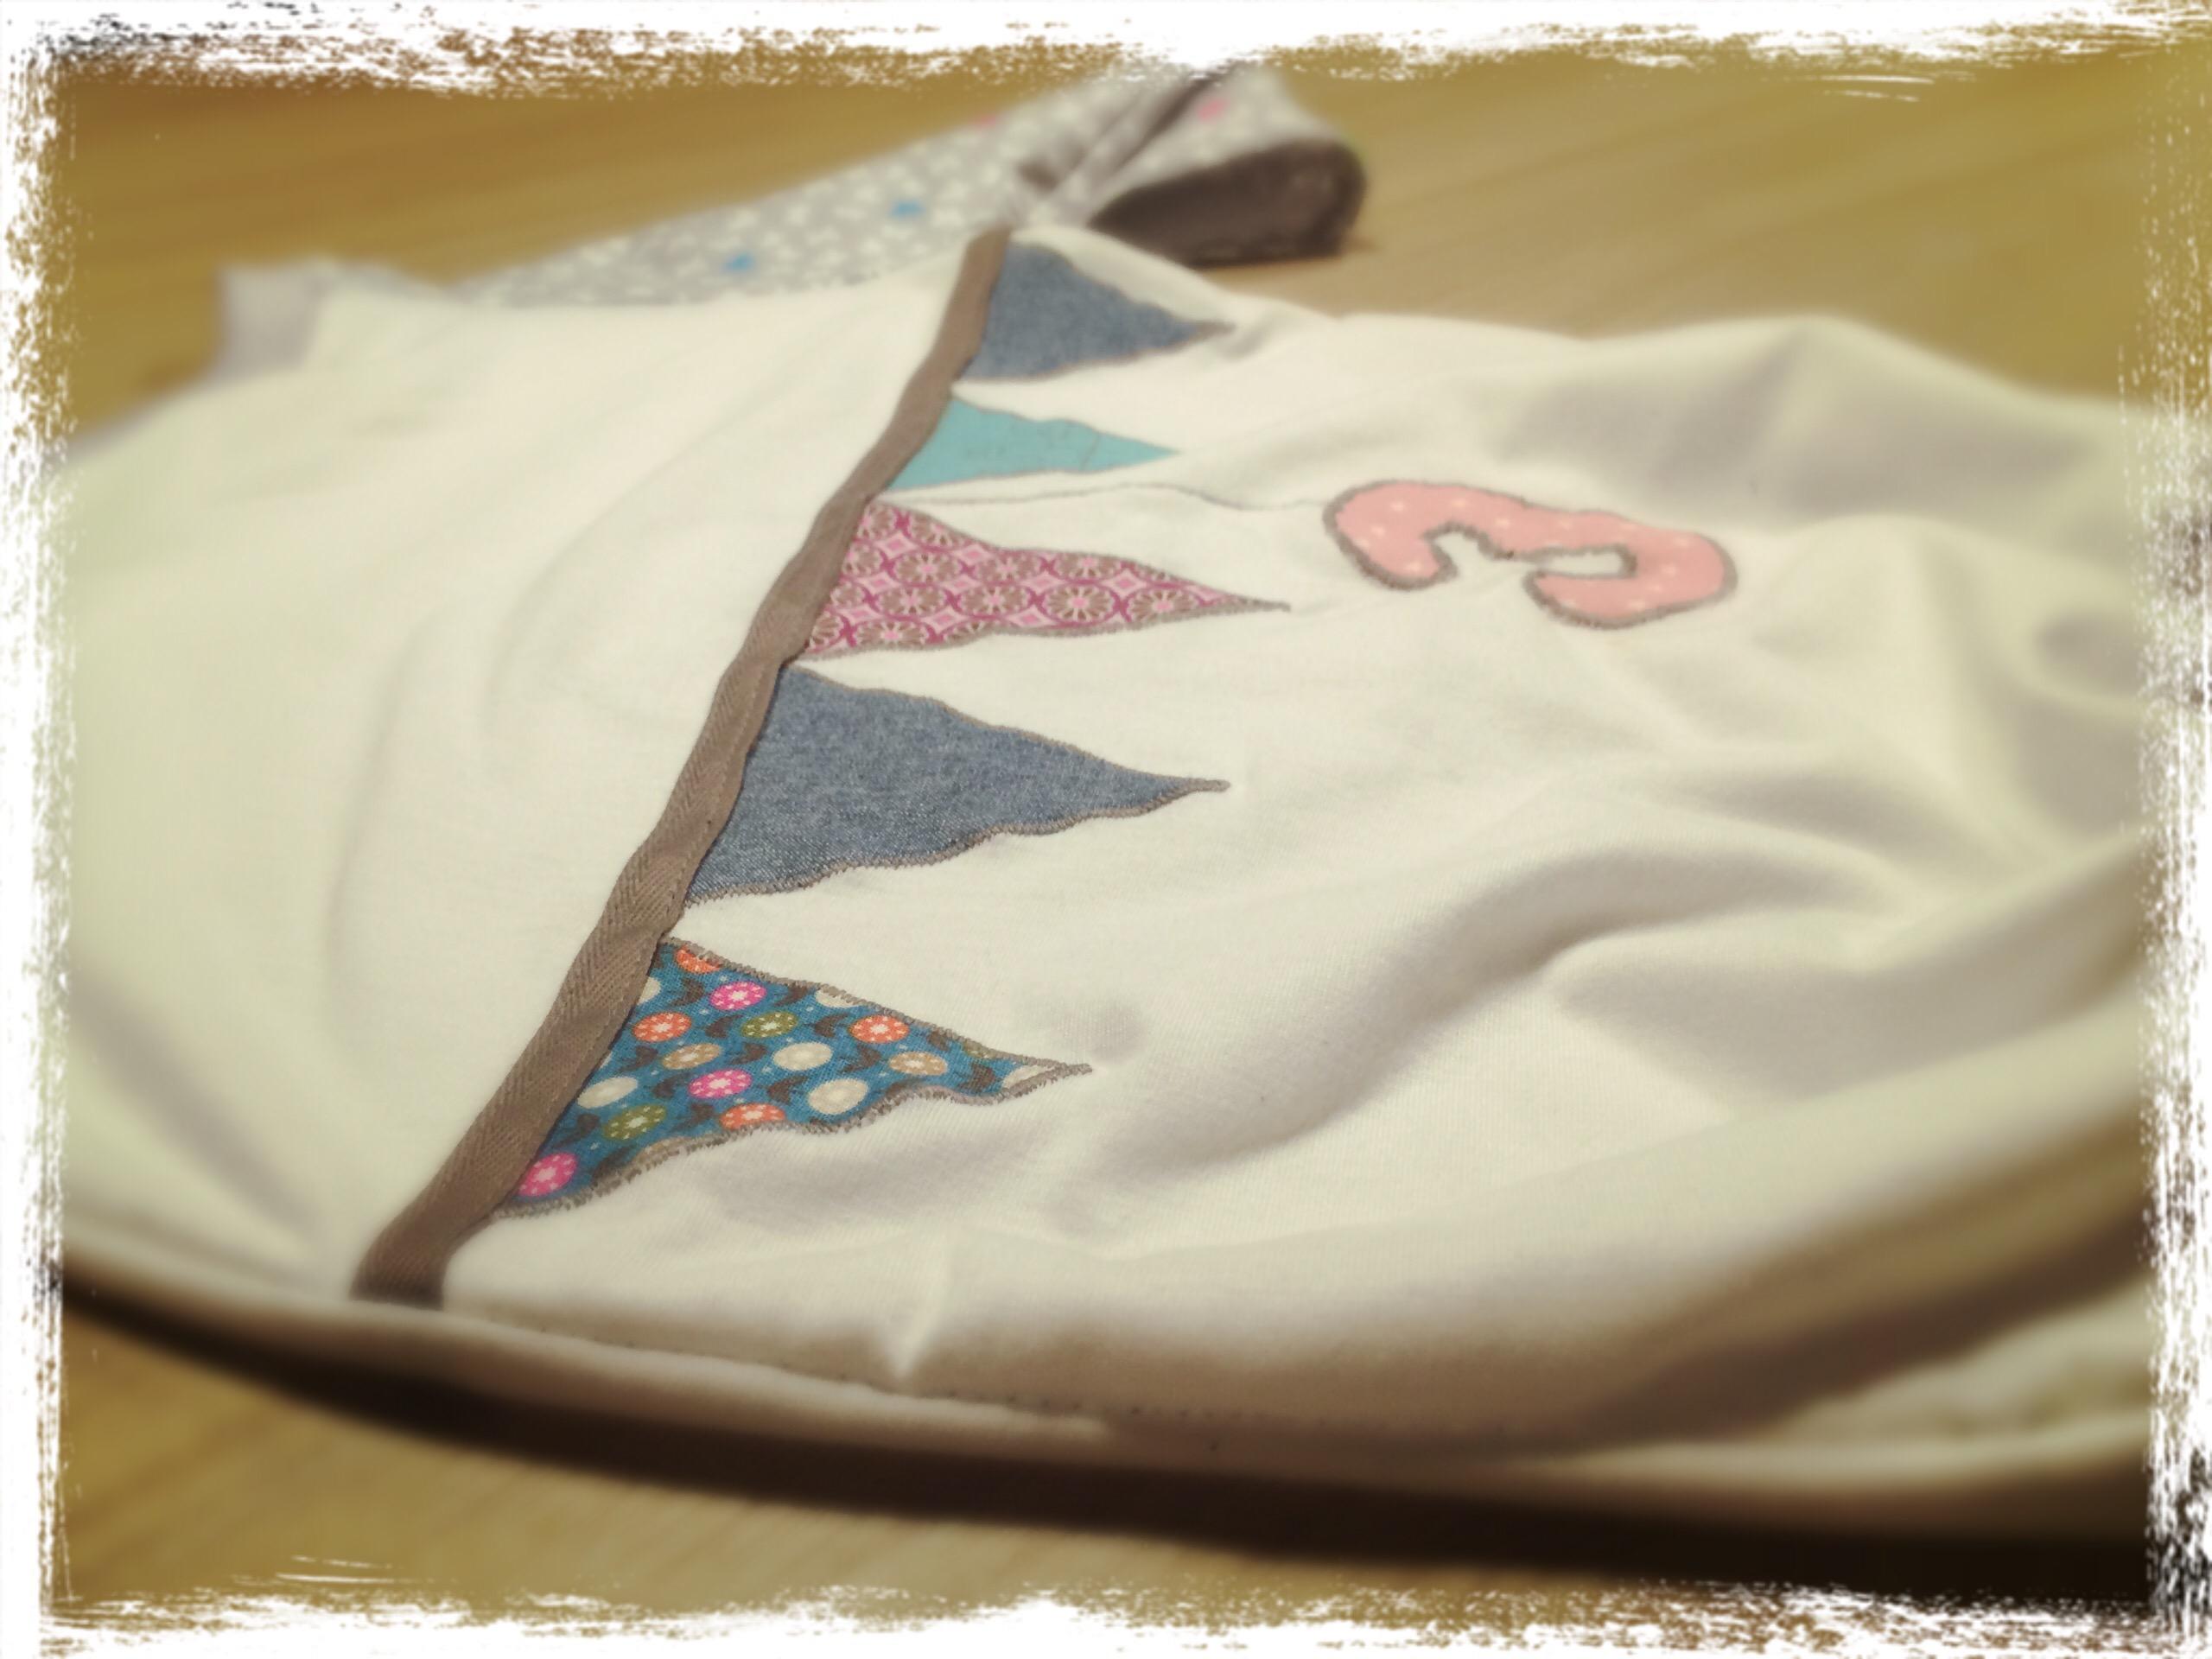 Geburtstags-Shirt nähen für Anfänger – mamAhoi